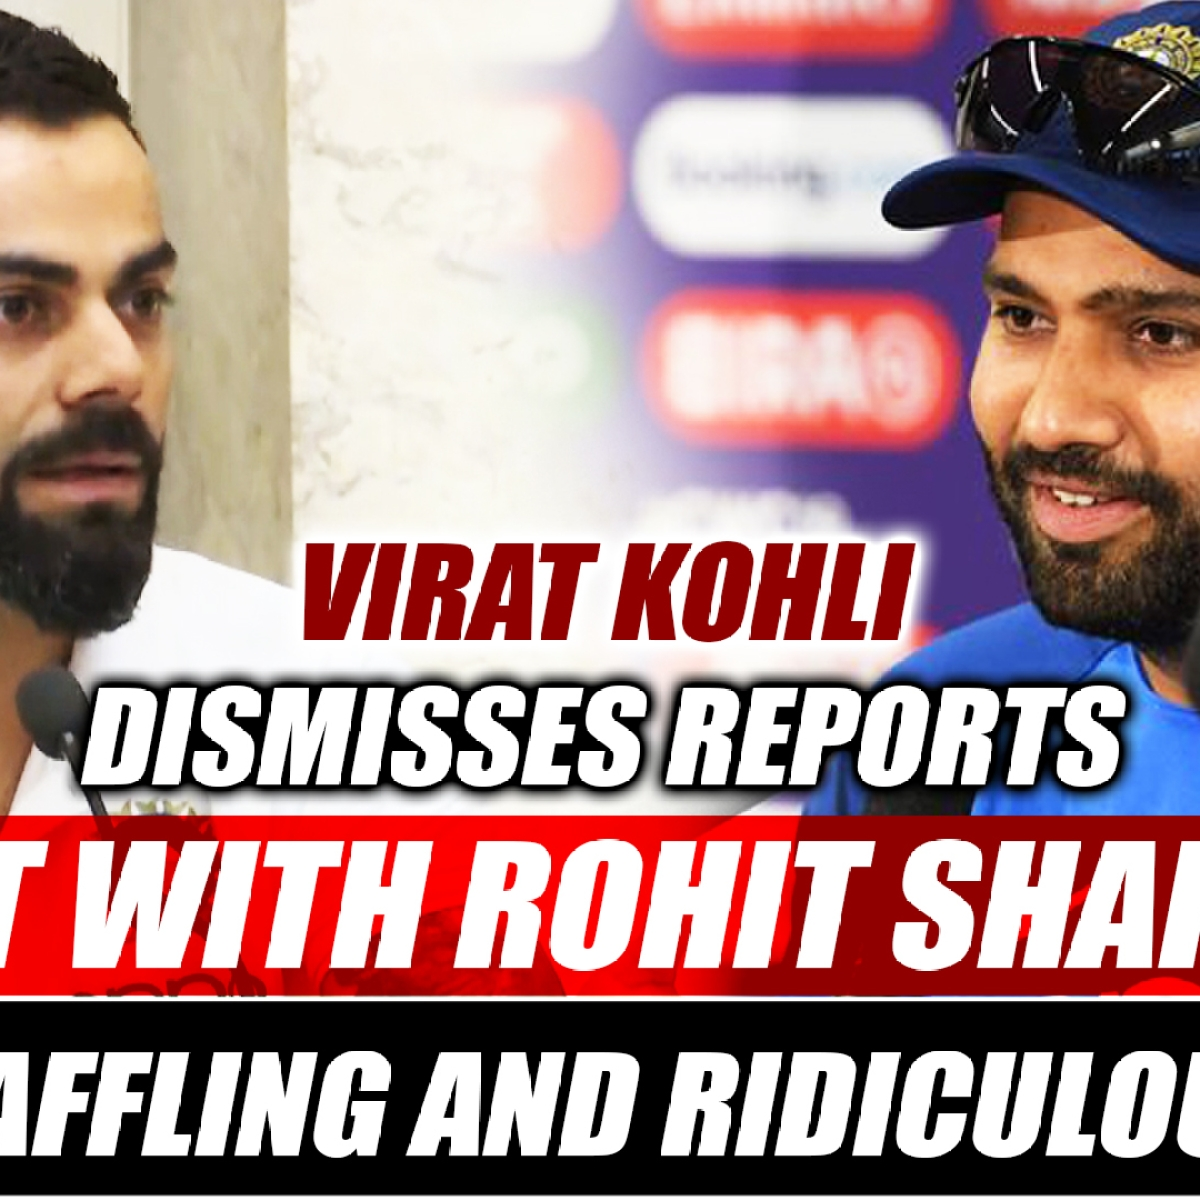 Virat Kohli Dismisses Reports Of Rift With Rohit Sharma, Calls It 'Baffling And Ridiculous'